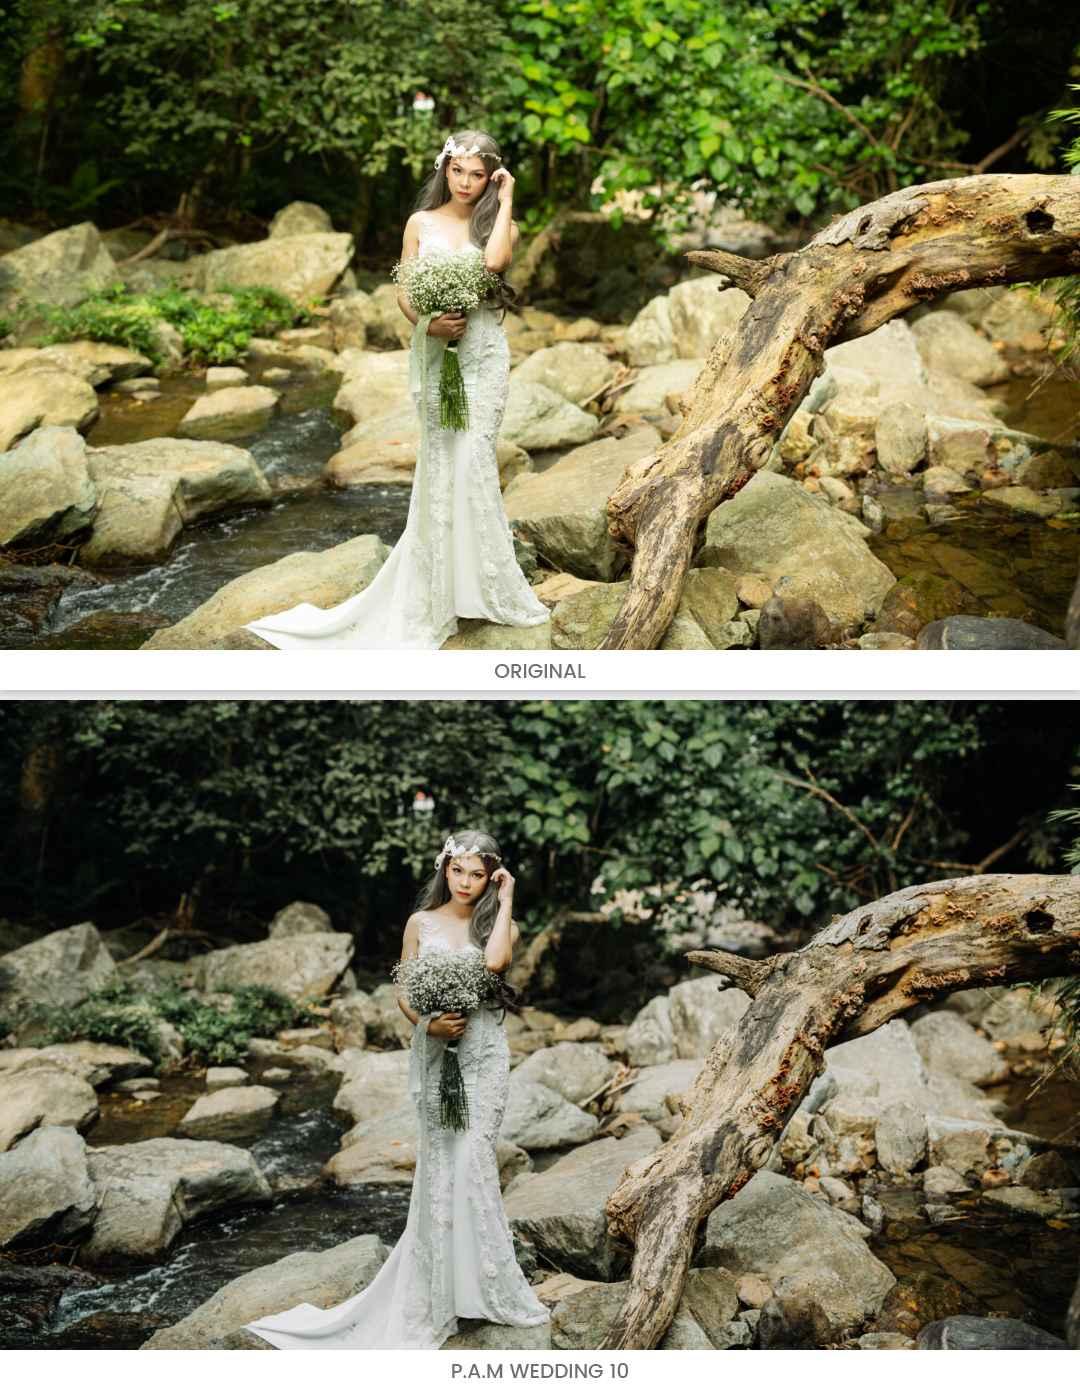 P.A.M WEDDING Presets